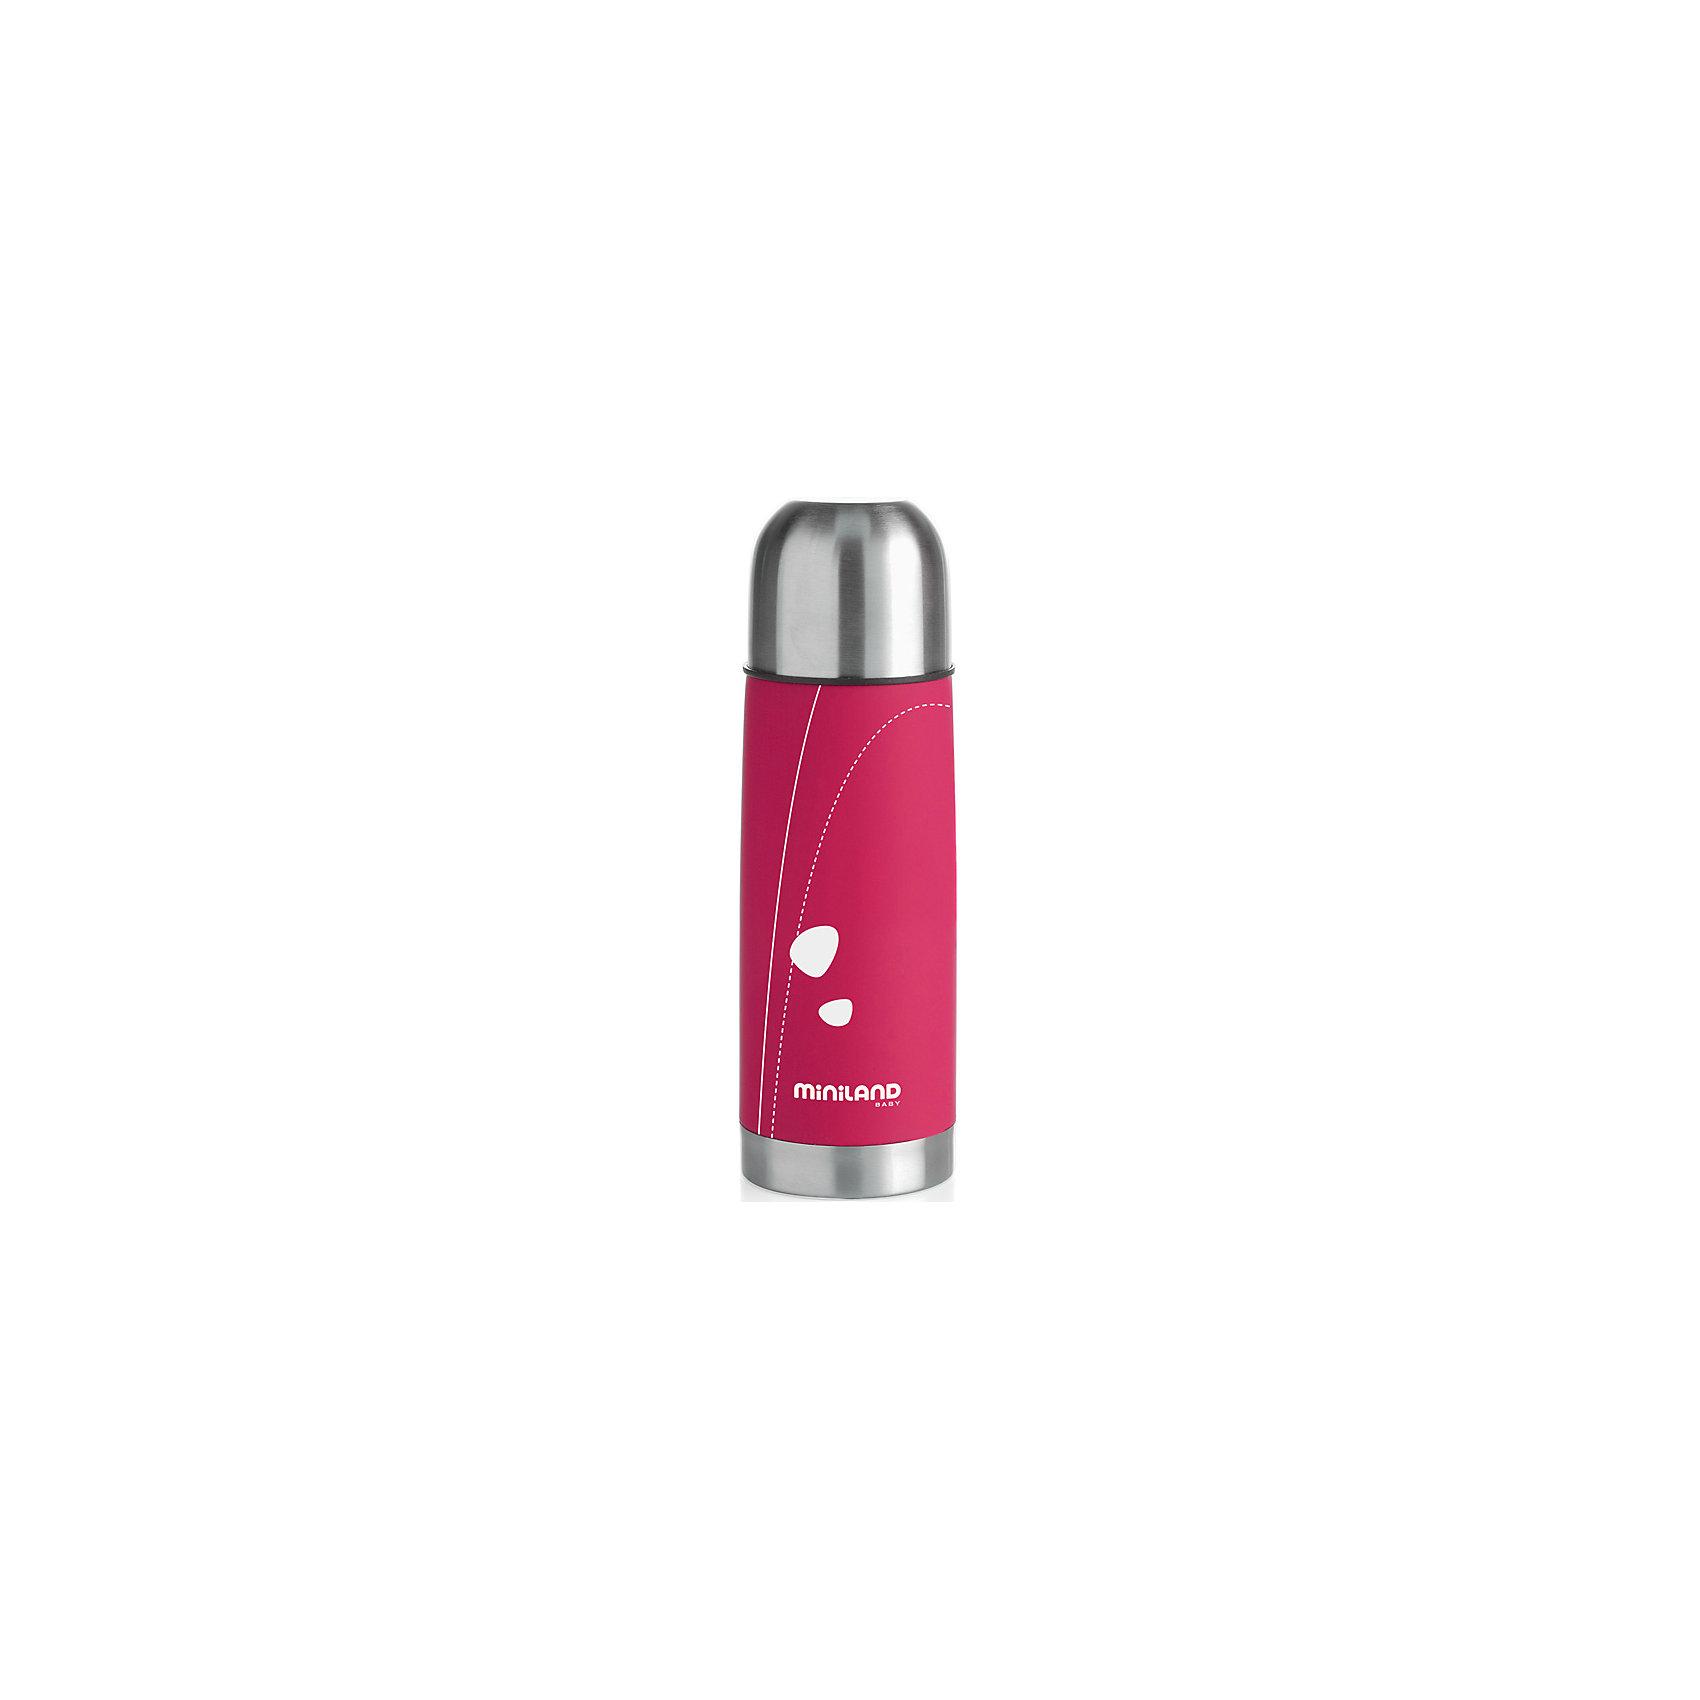 Термос для жидкостей Miniland SOFT THERMO 350 мл, розовый